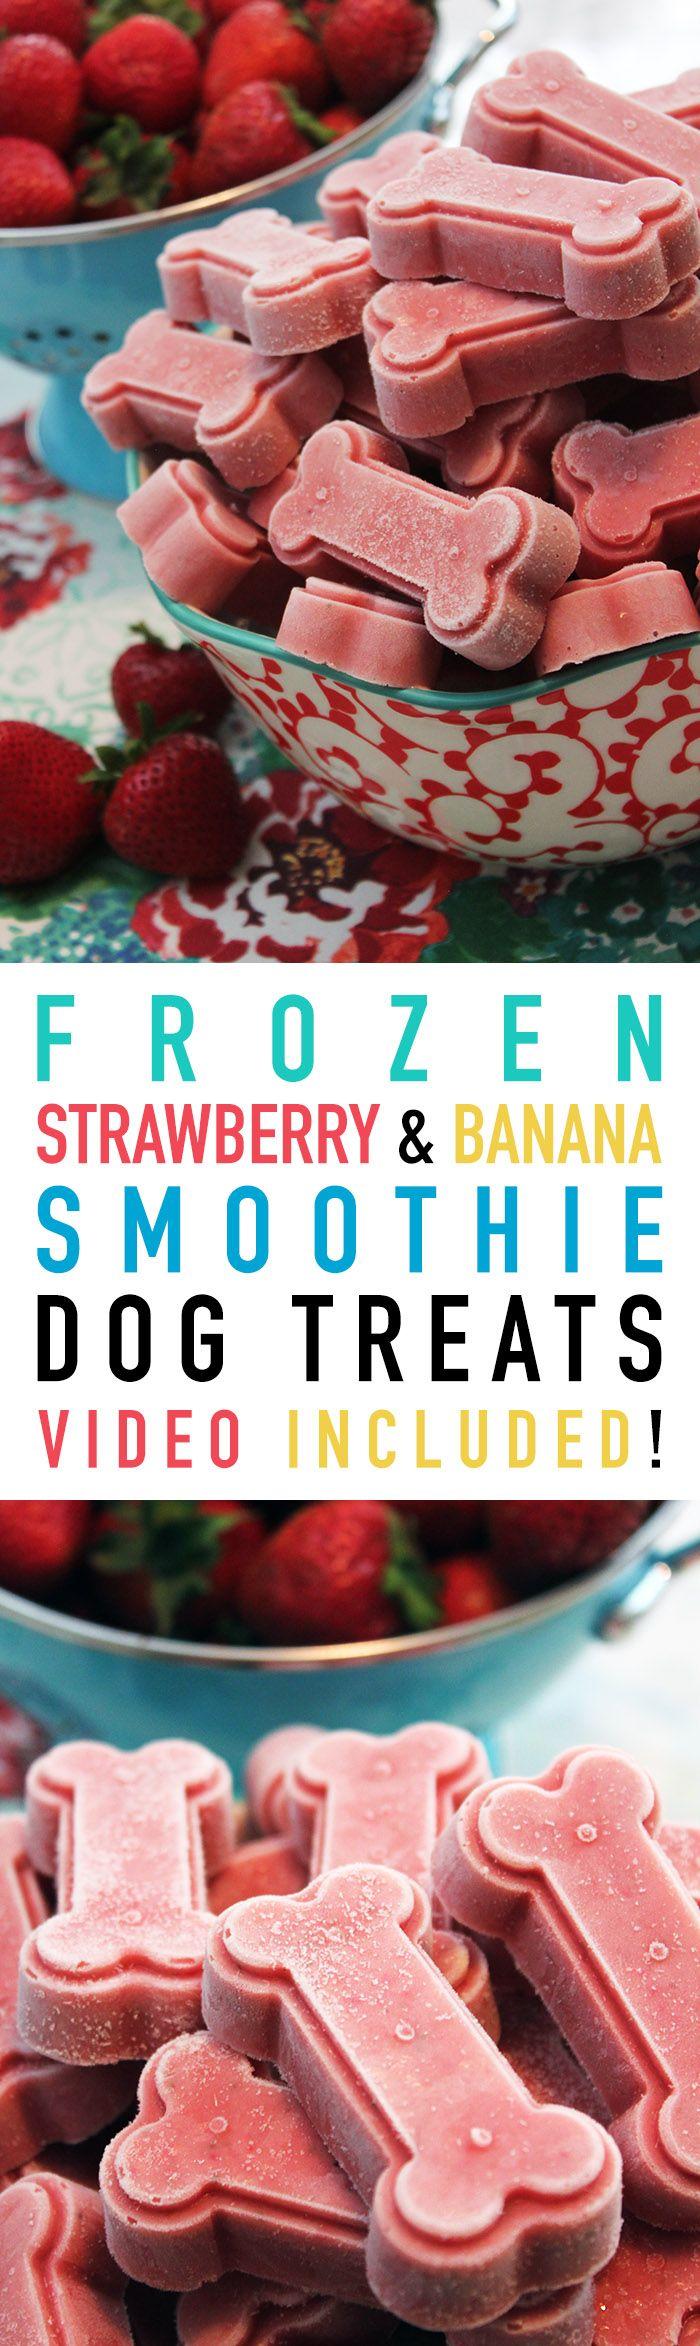 Strawberry Banana Smoothie Frozen Dog Treats | The